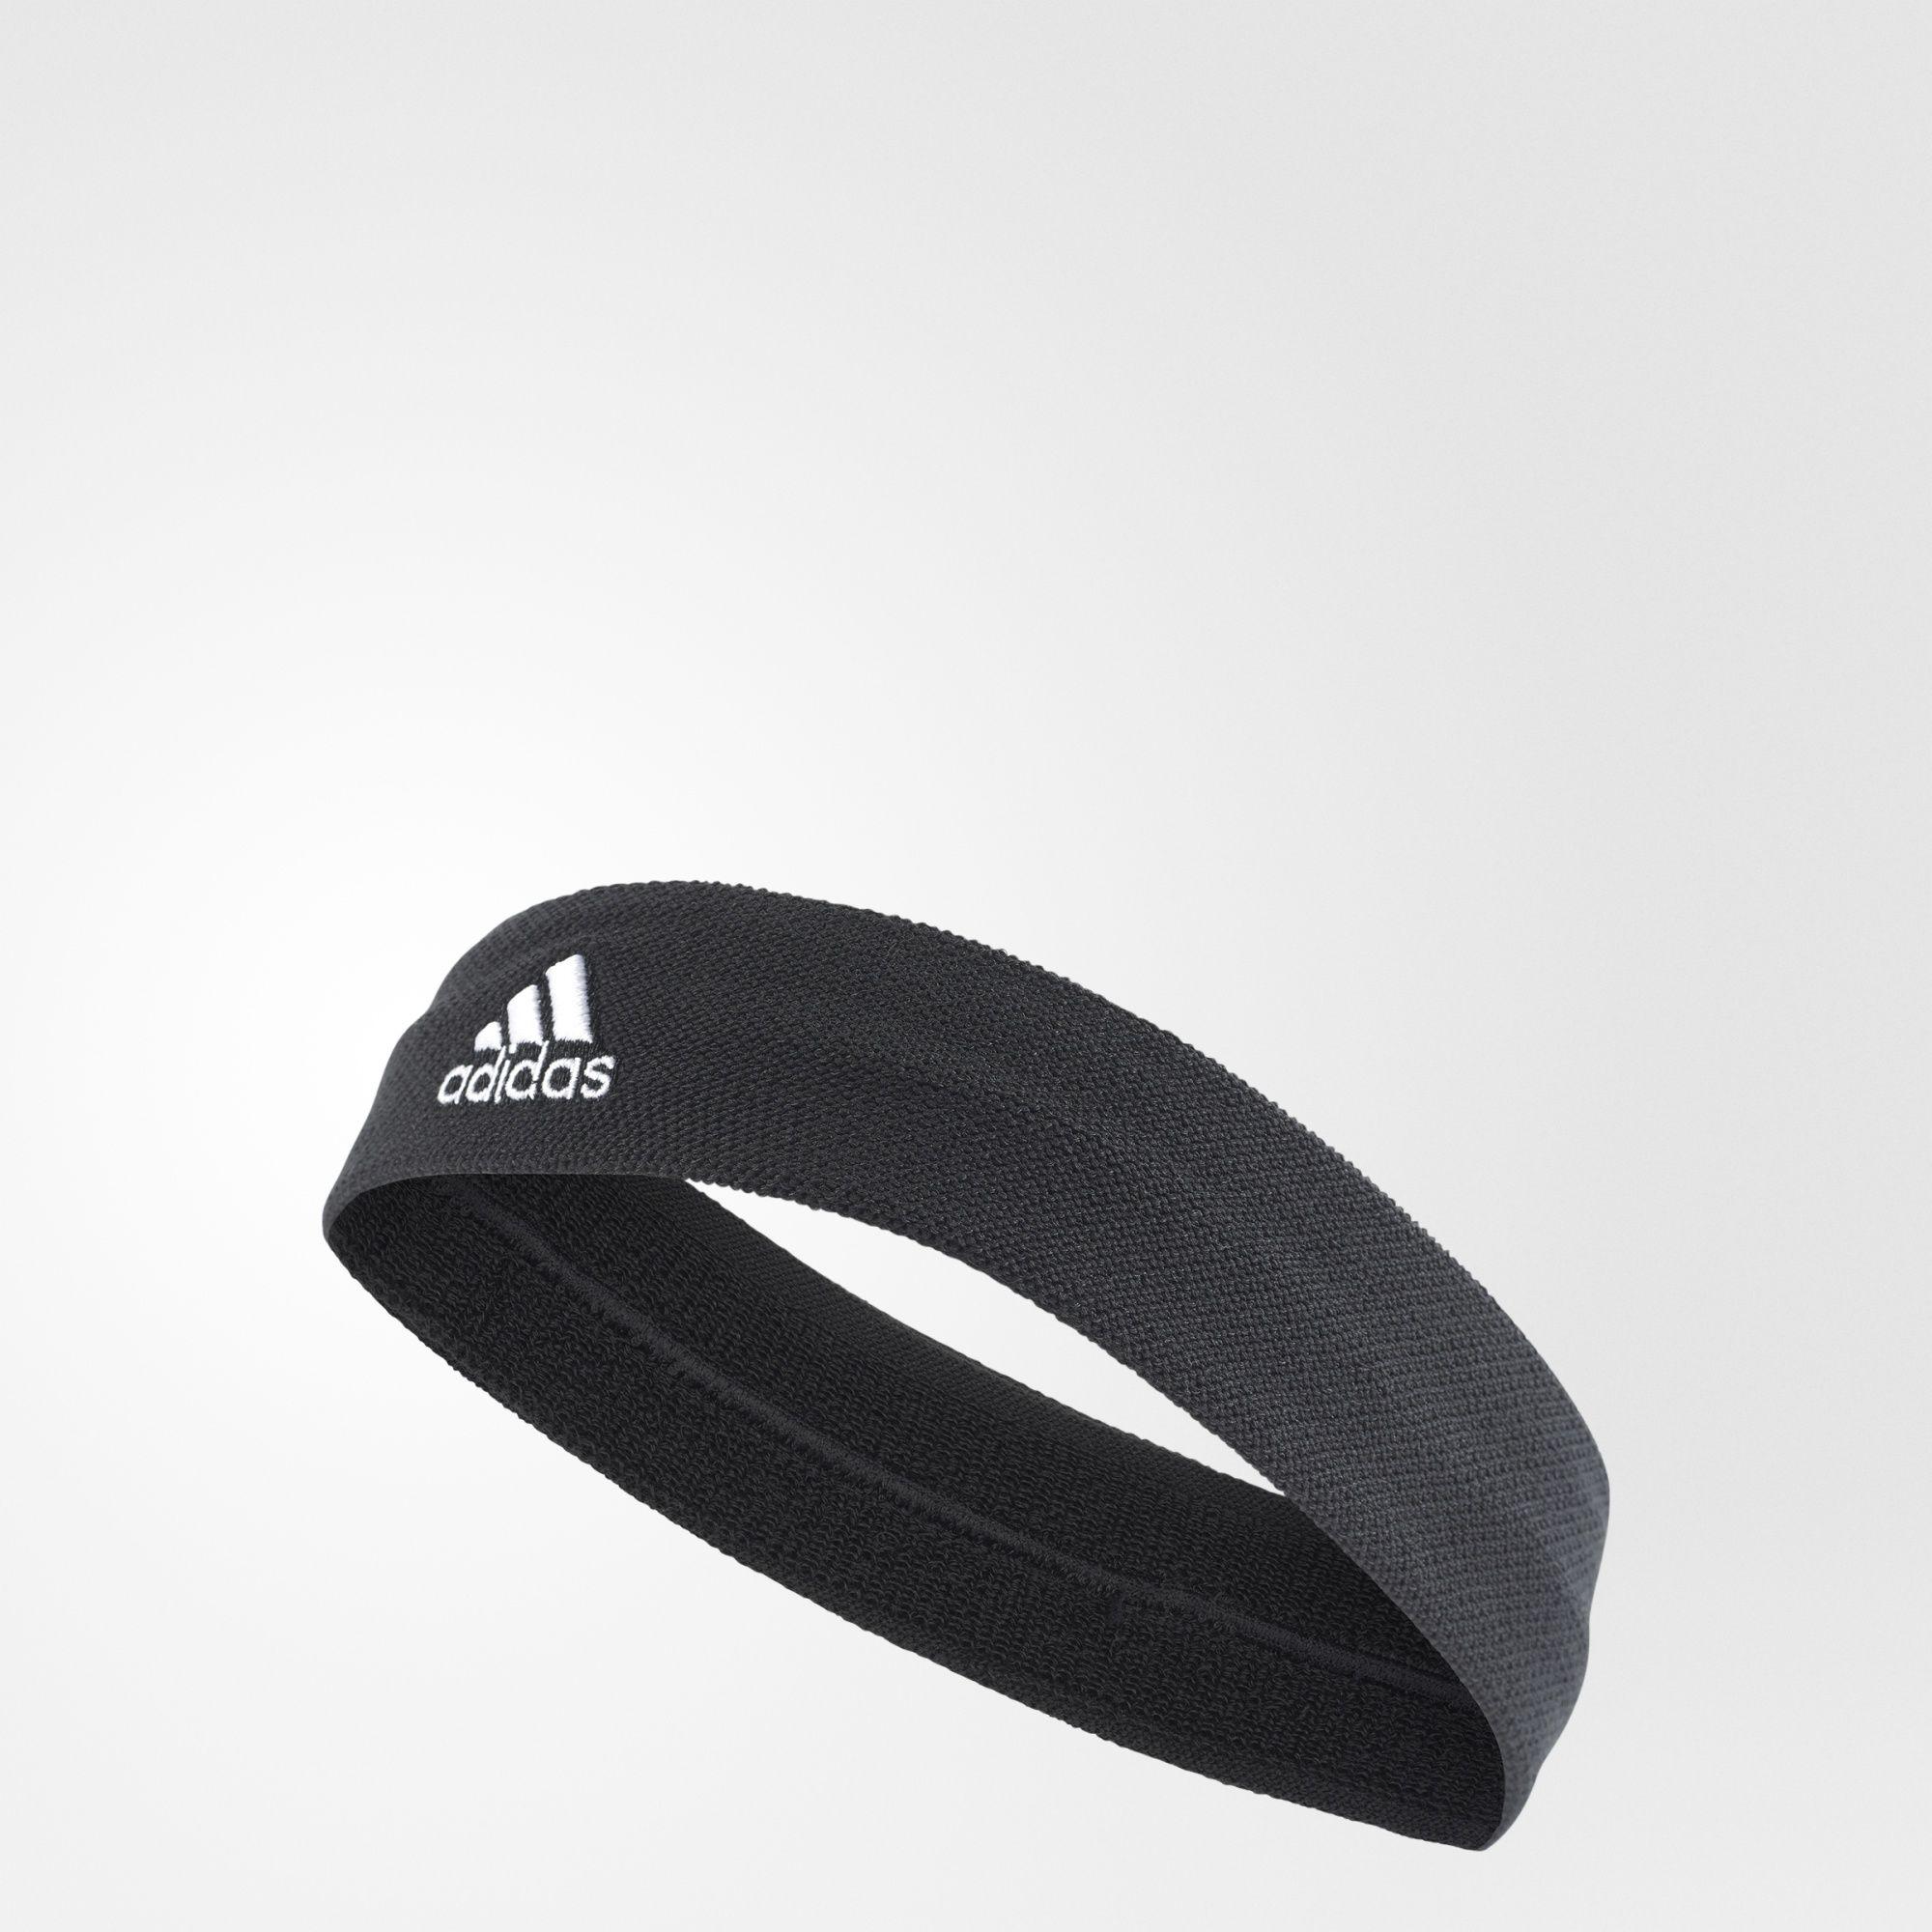 ADIDAS TEN HEADBAND 頭帶 網球 黑 白【運動世界】S97910